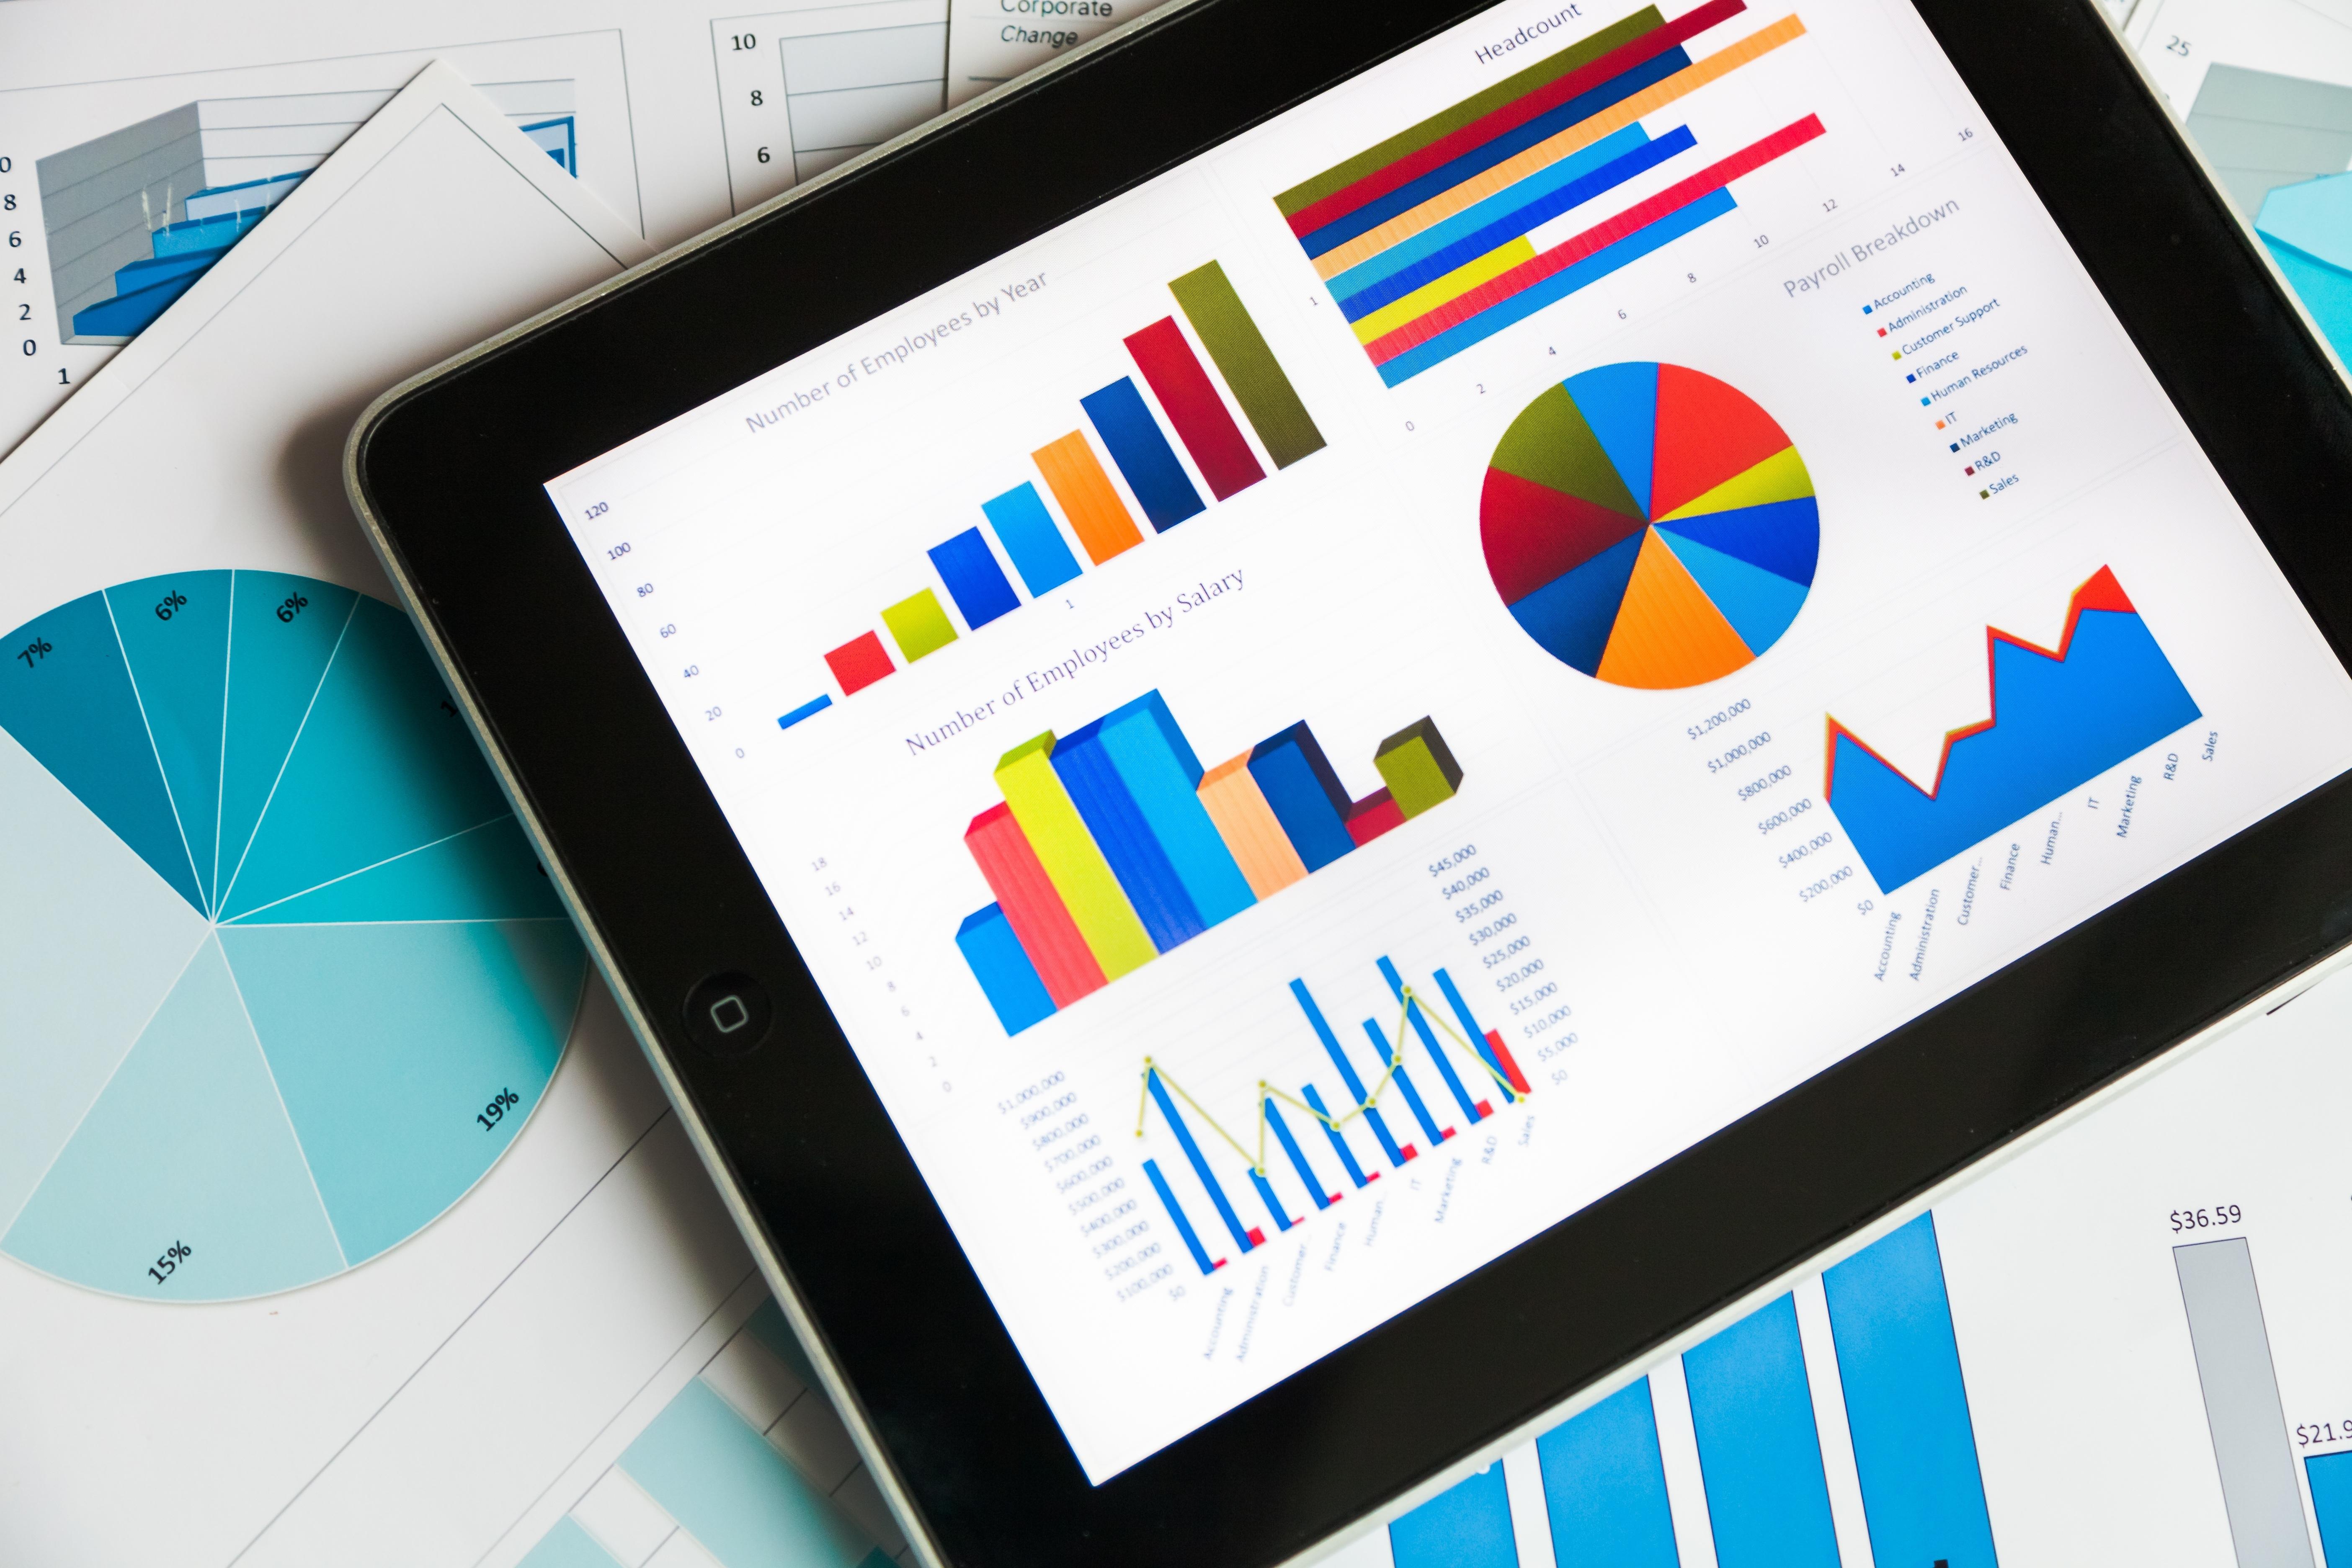 Finance, Fonds, Charts